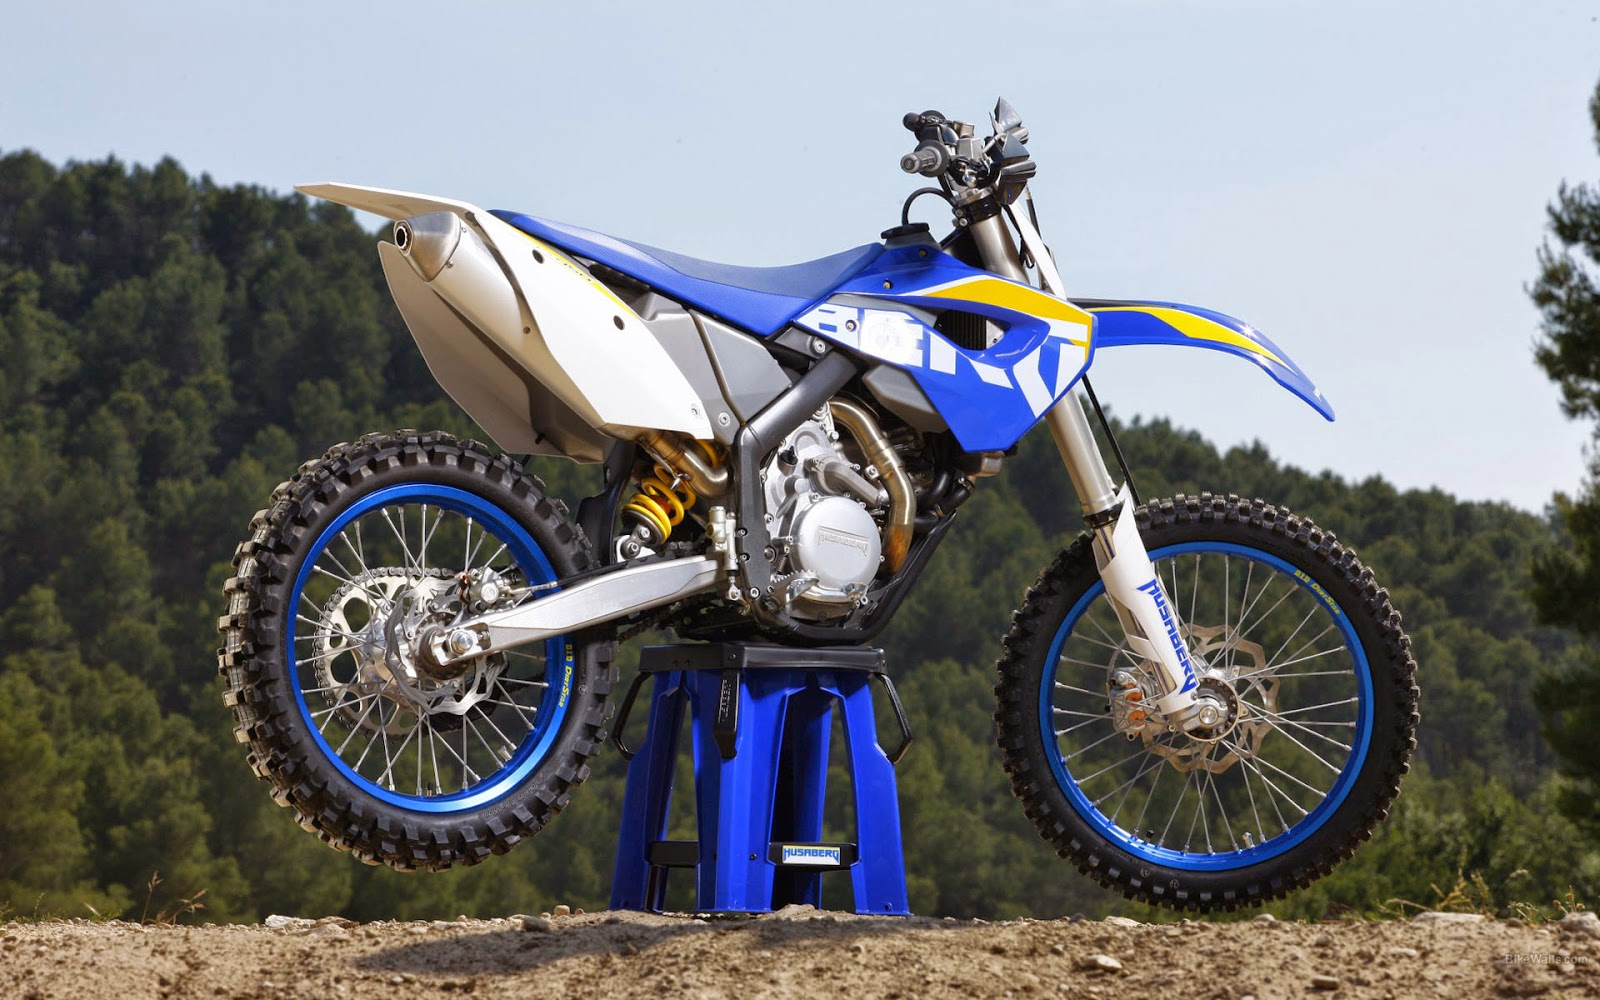 Husaberg FX 450 Motorcycels Price